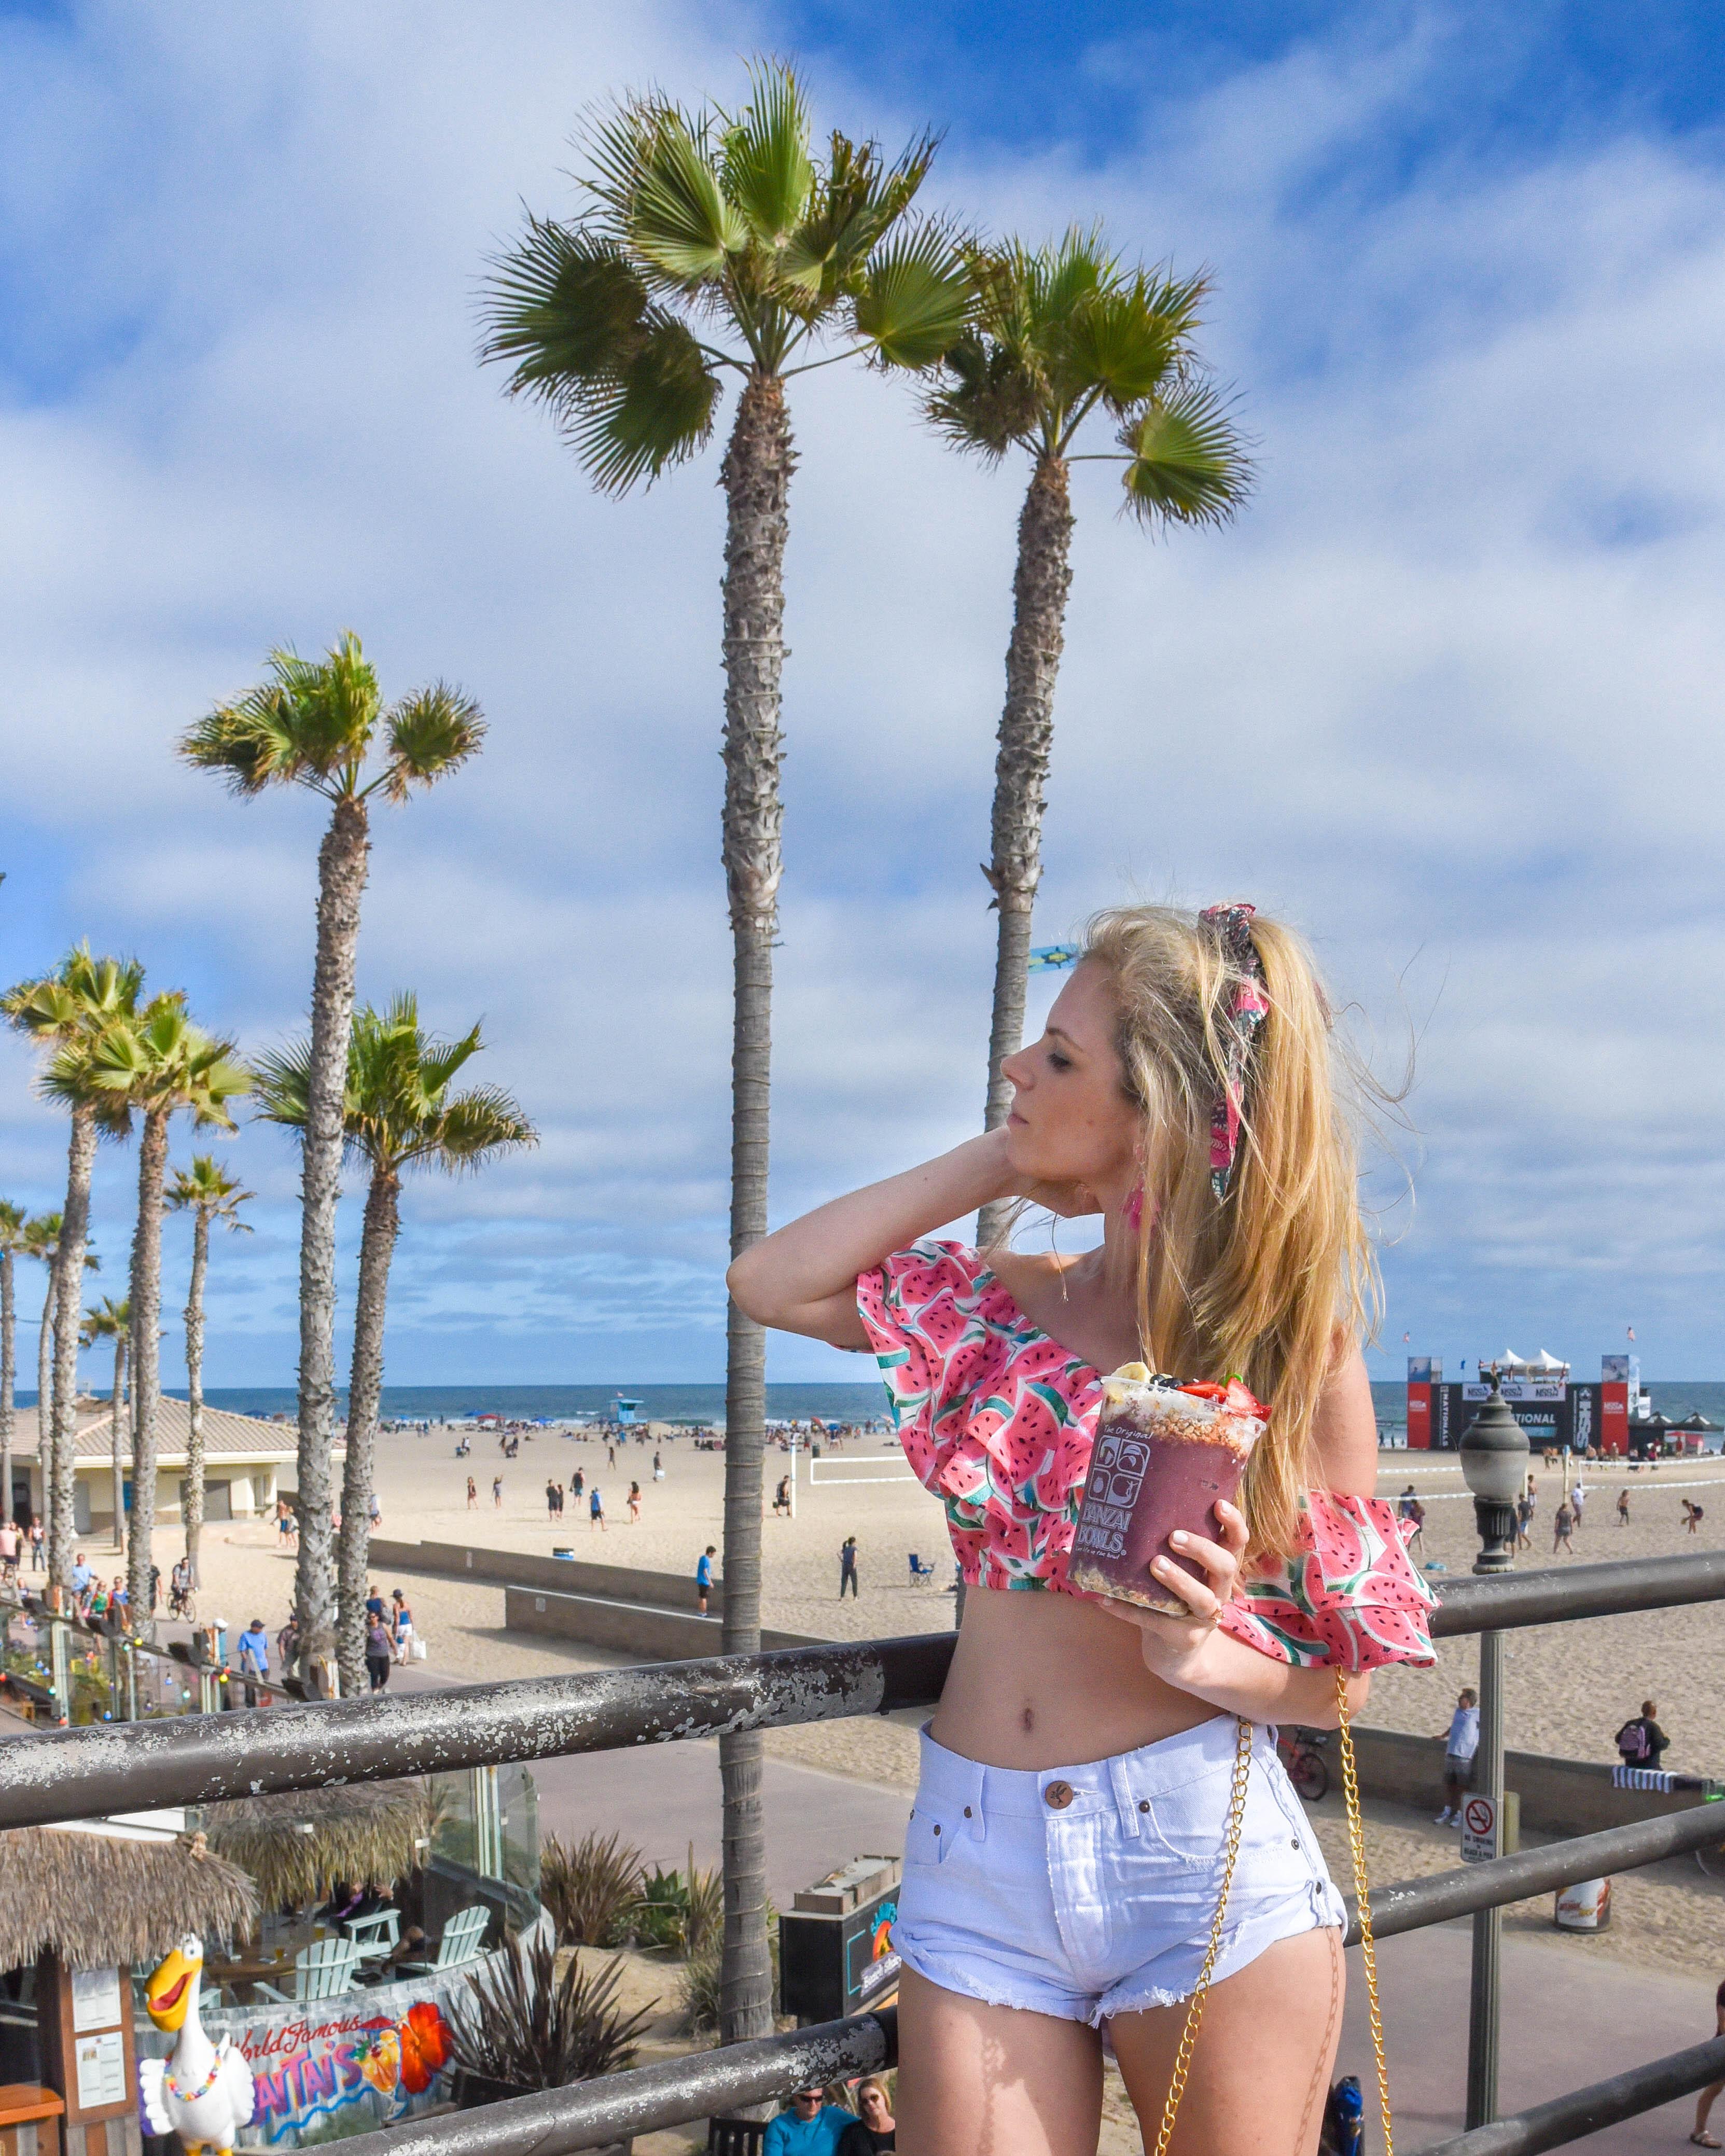 Huntington Beach Pier Surf City USA Banzai Bowl Travel Guide to Los Angeles California